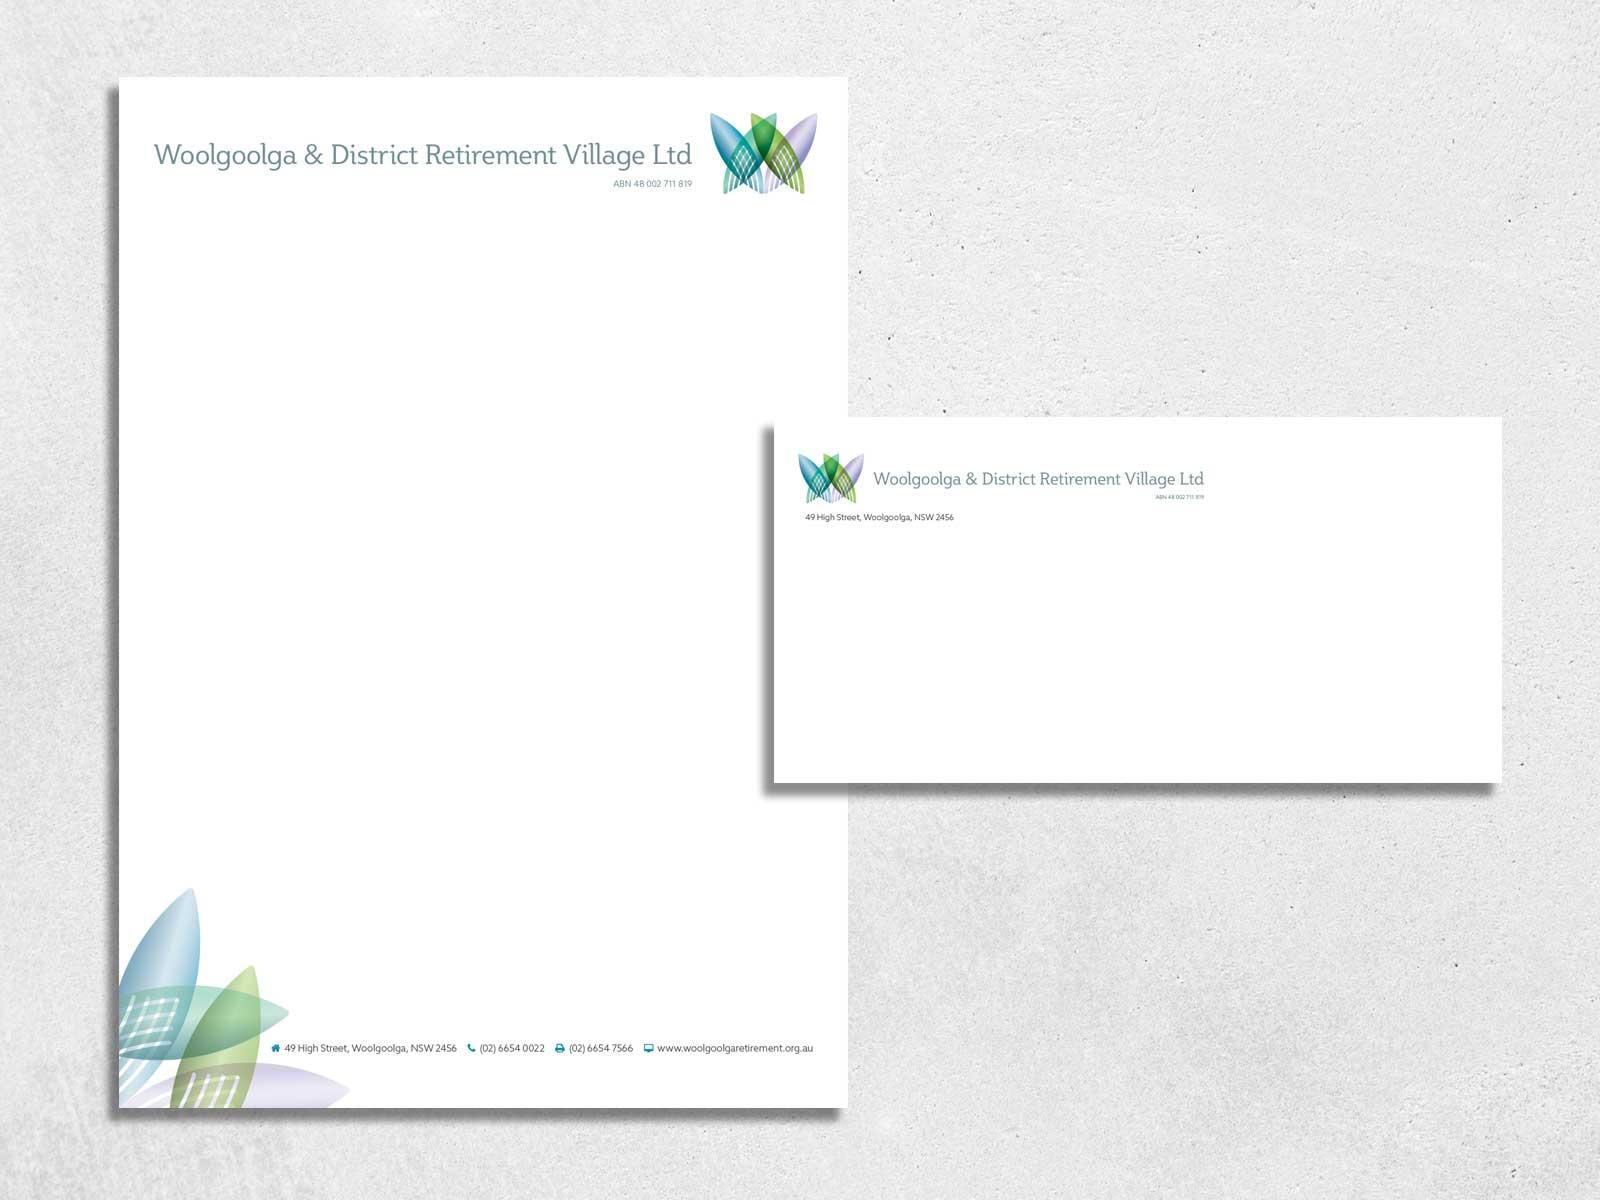 Woopi_retire_Stationery-web